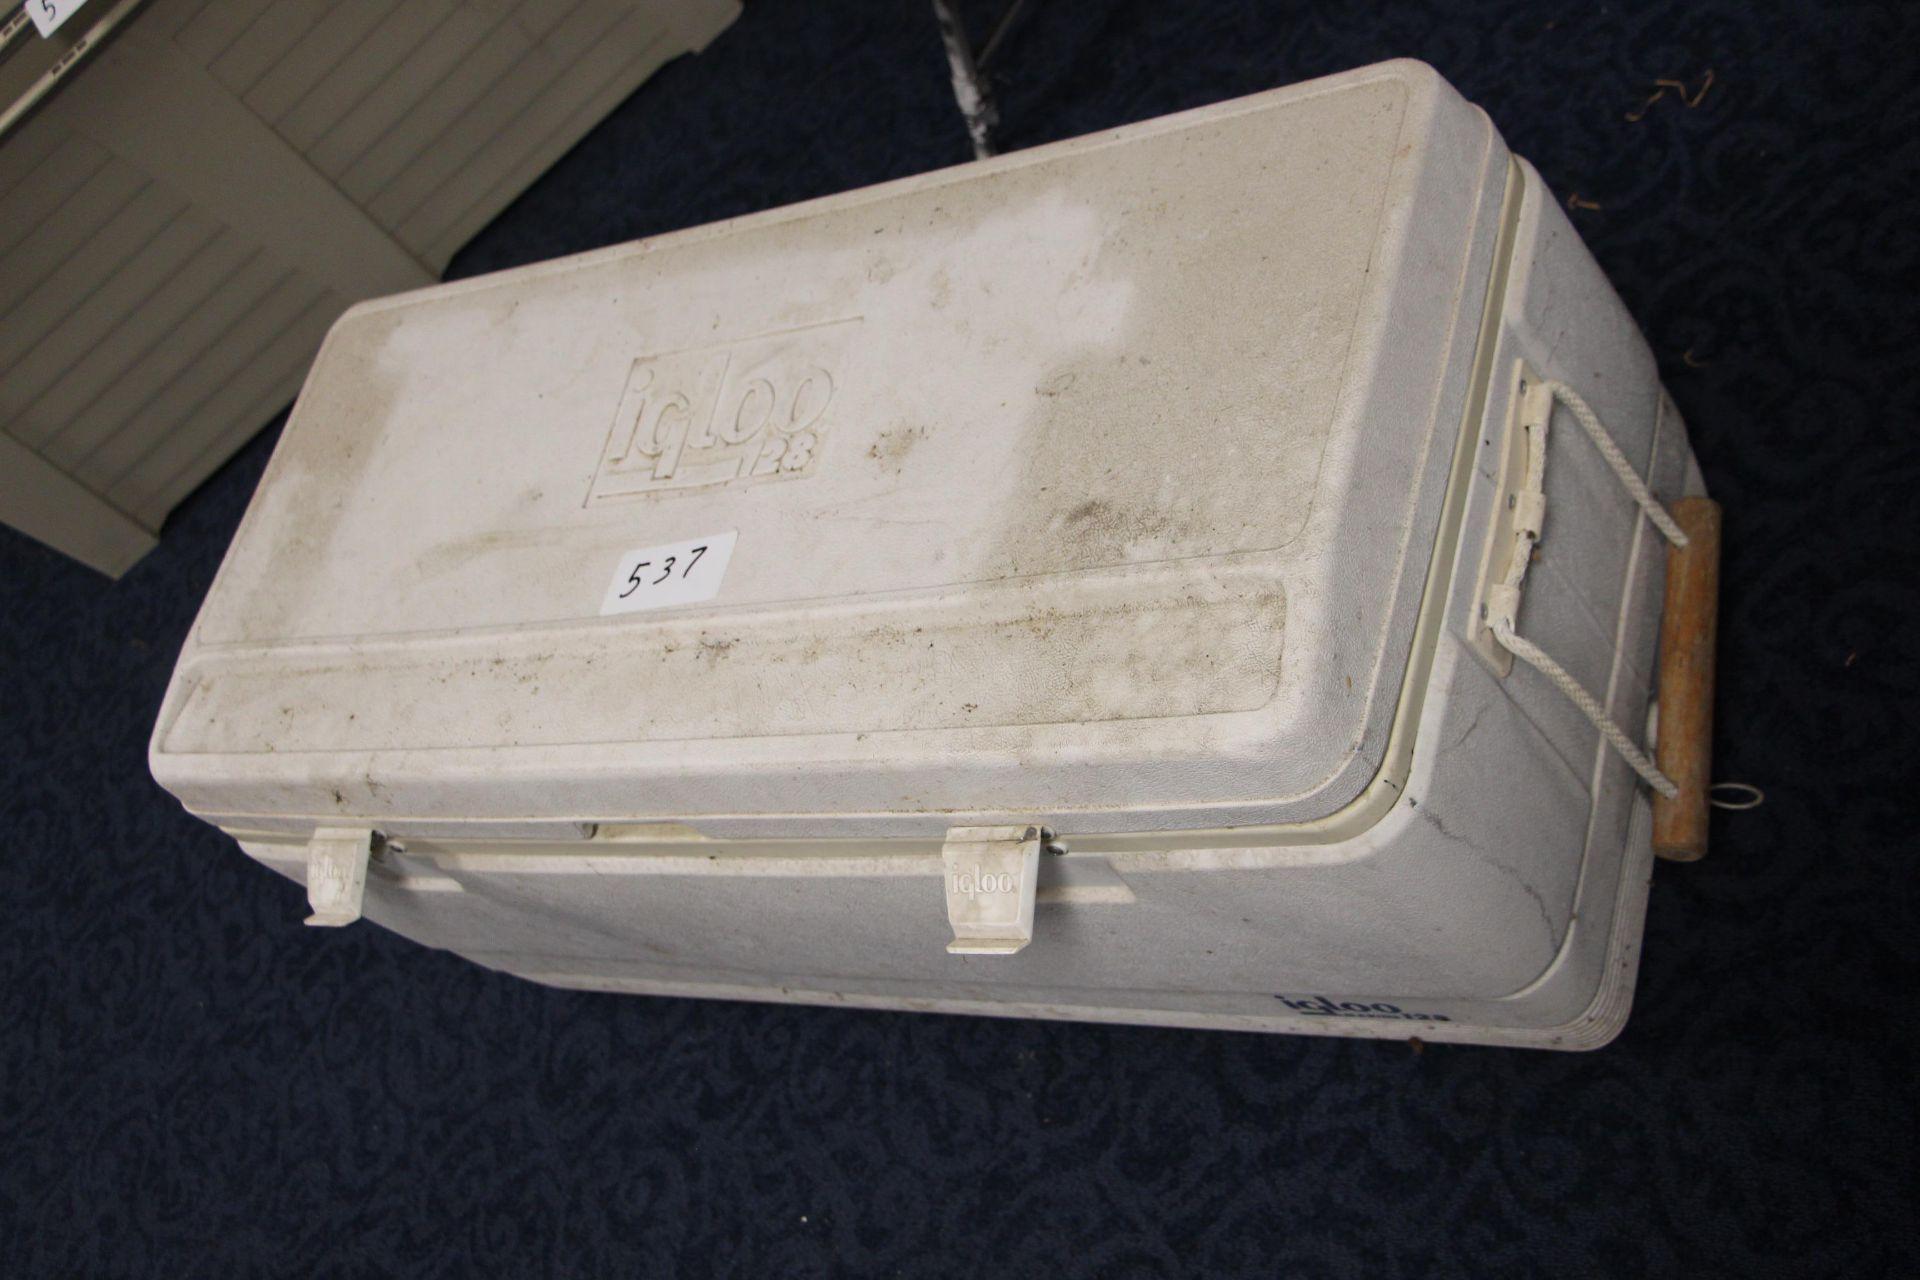 Lot 537 - Igloo large cooler